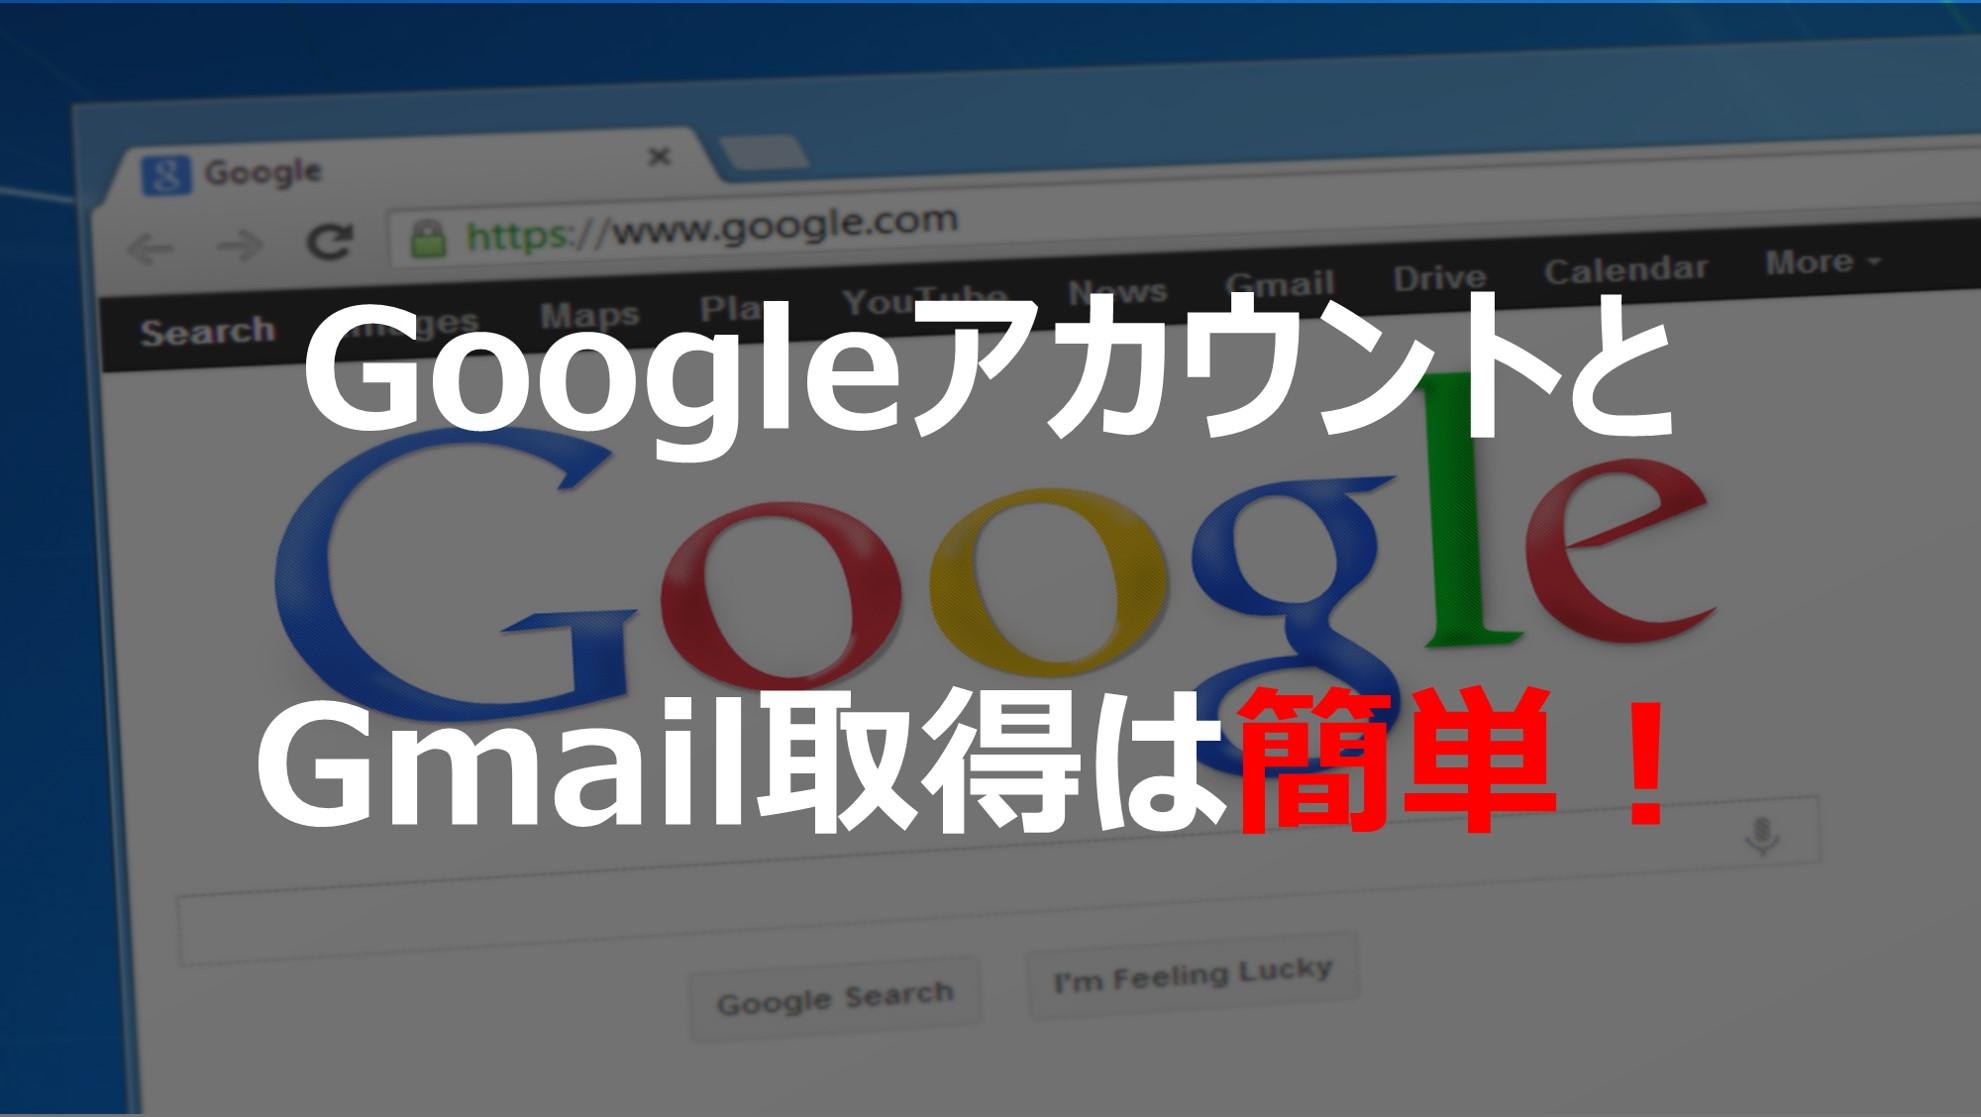 GoogleアカウントとGmailアドレスの取得